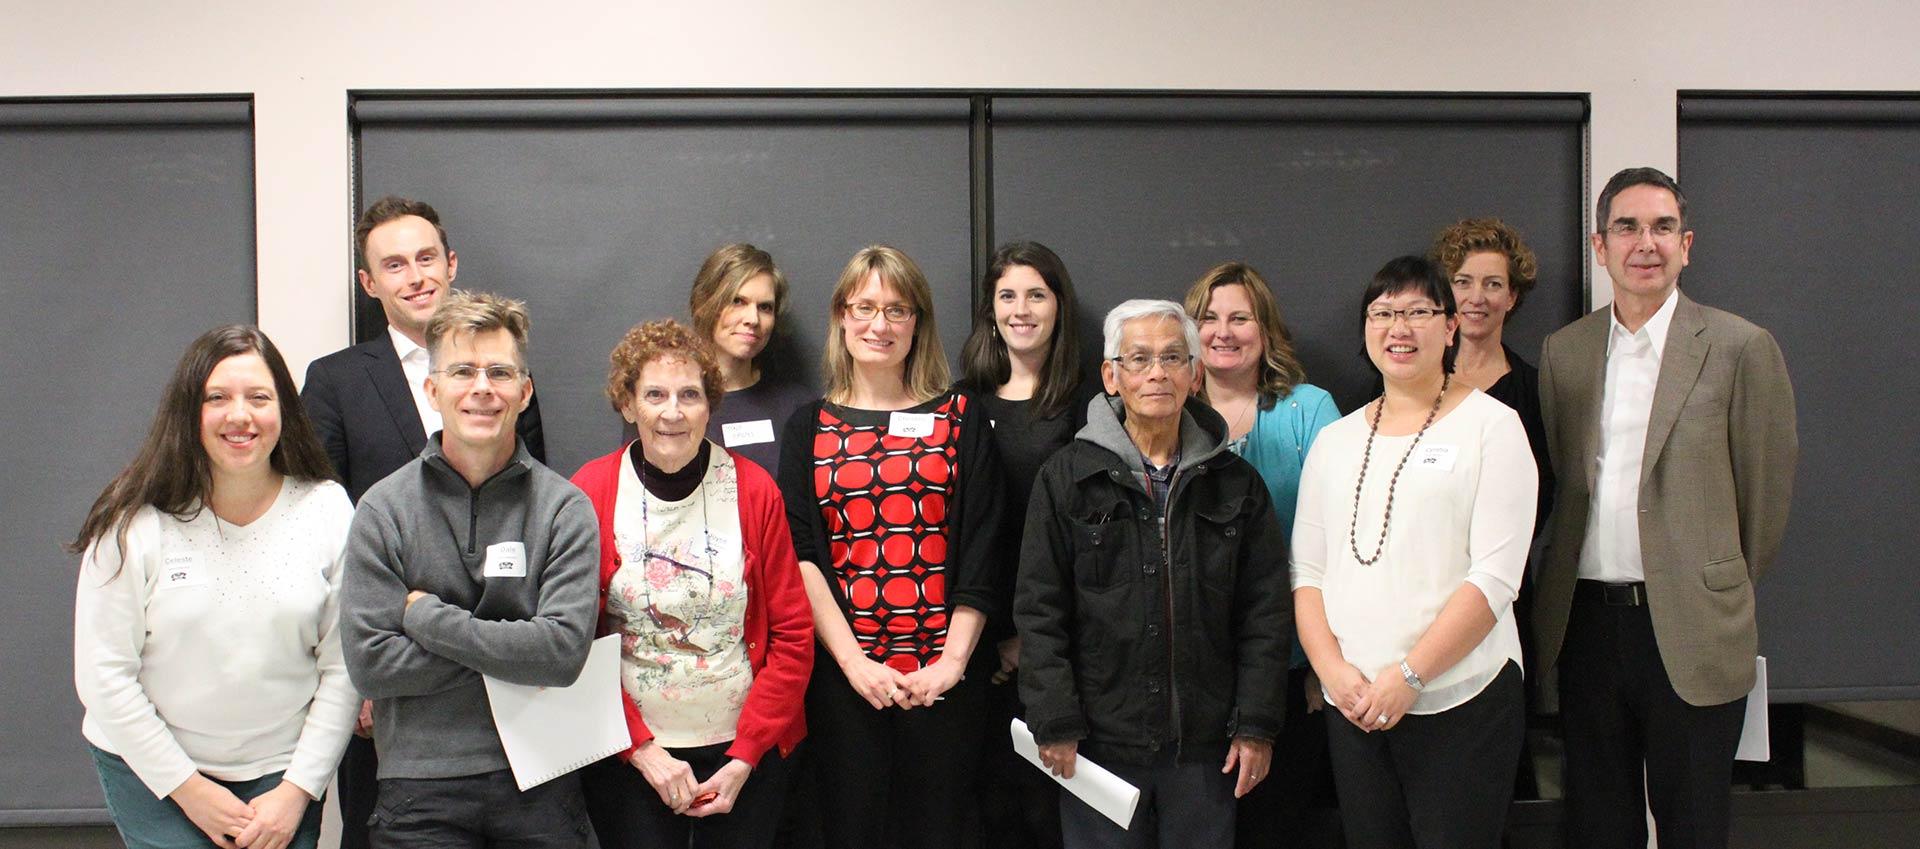 Annual General Meeting Douglas Park Community Association-Nov 21